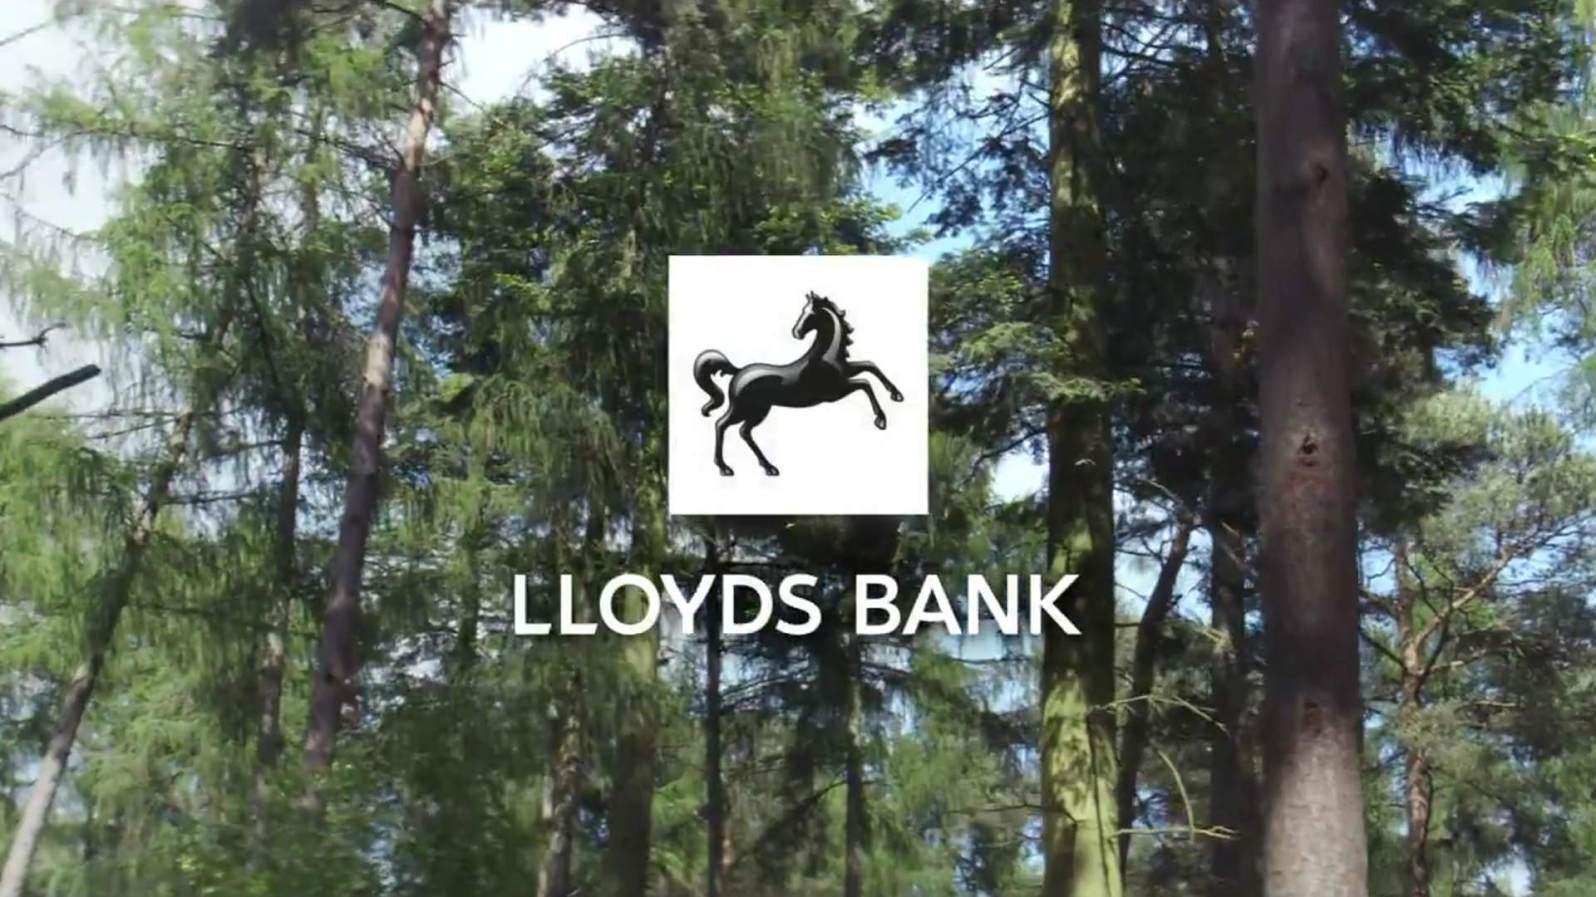 sc-lloyds-bank-horse-story-3